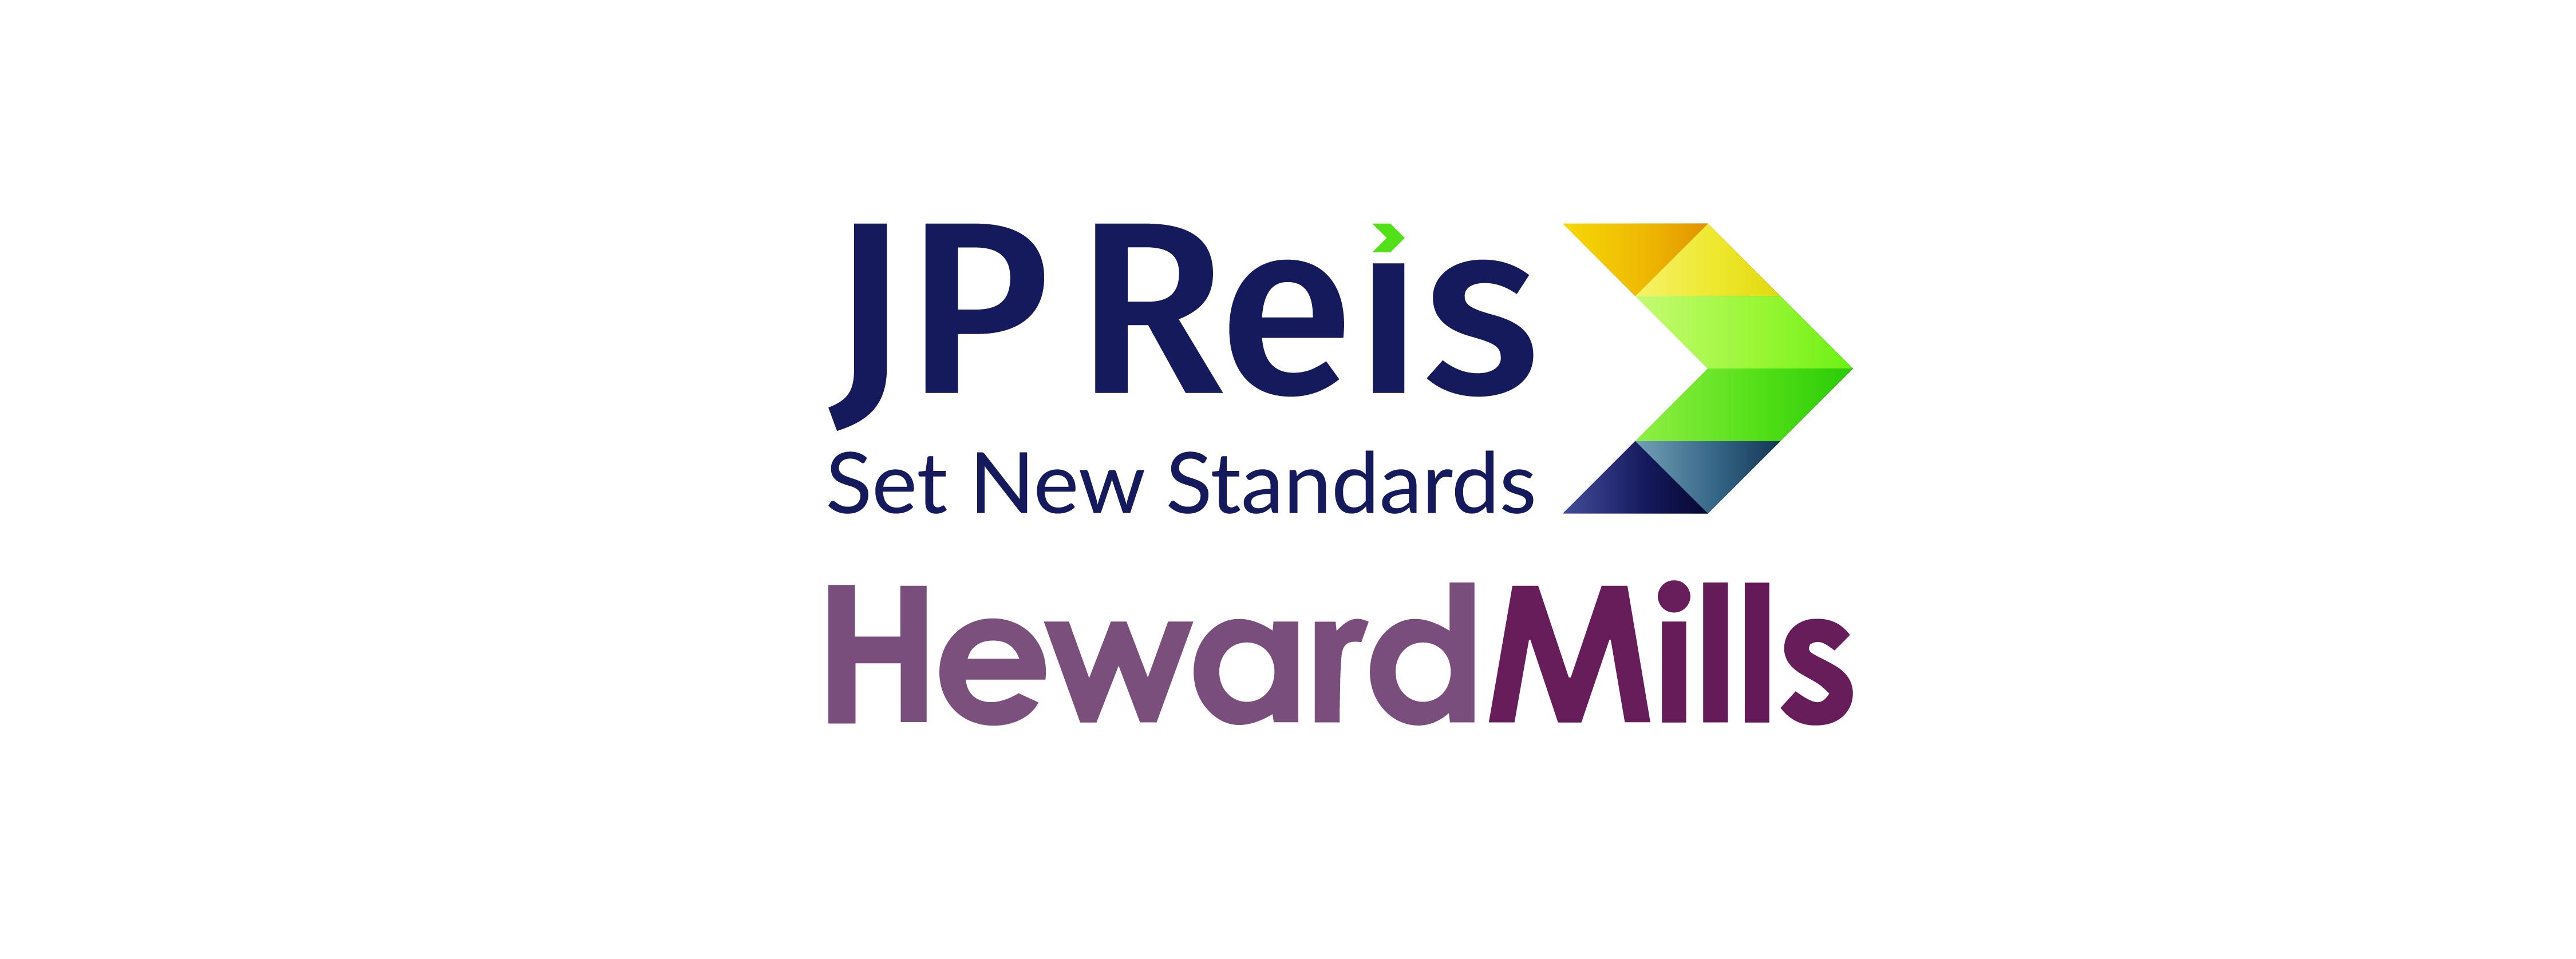 HewardMills, Data Protection Office